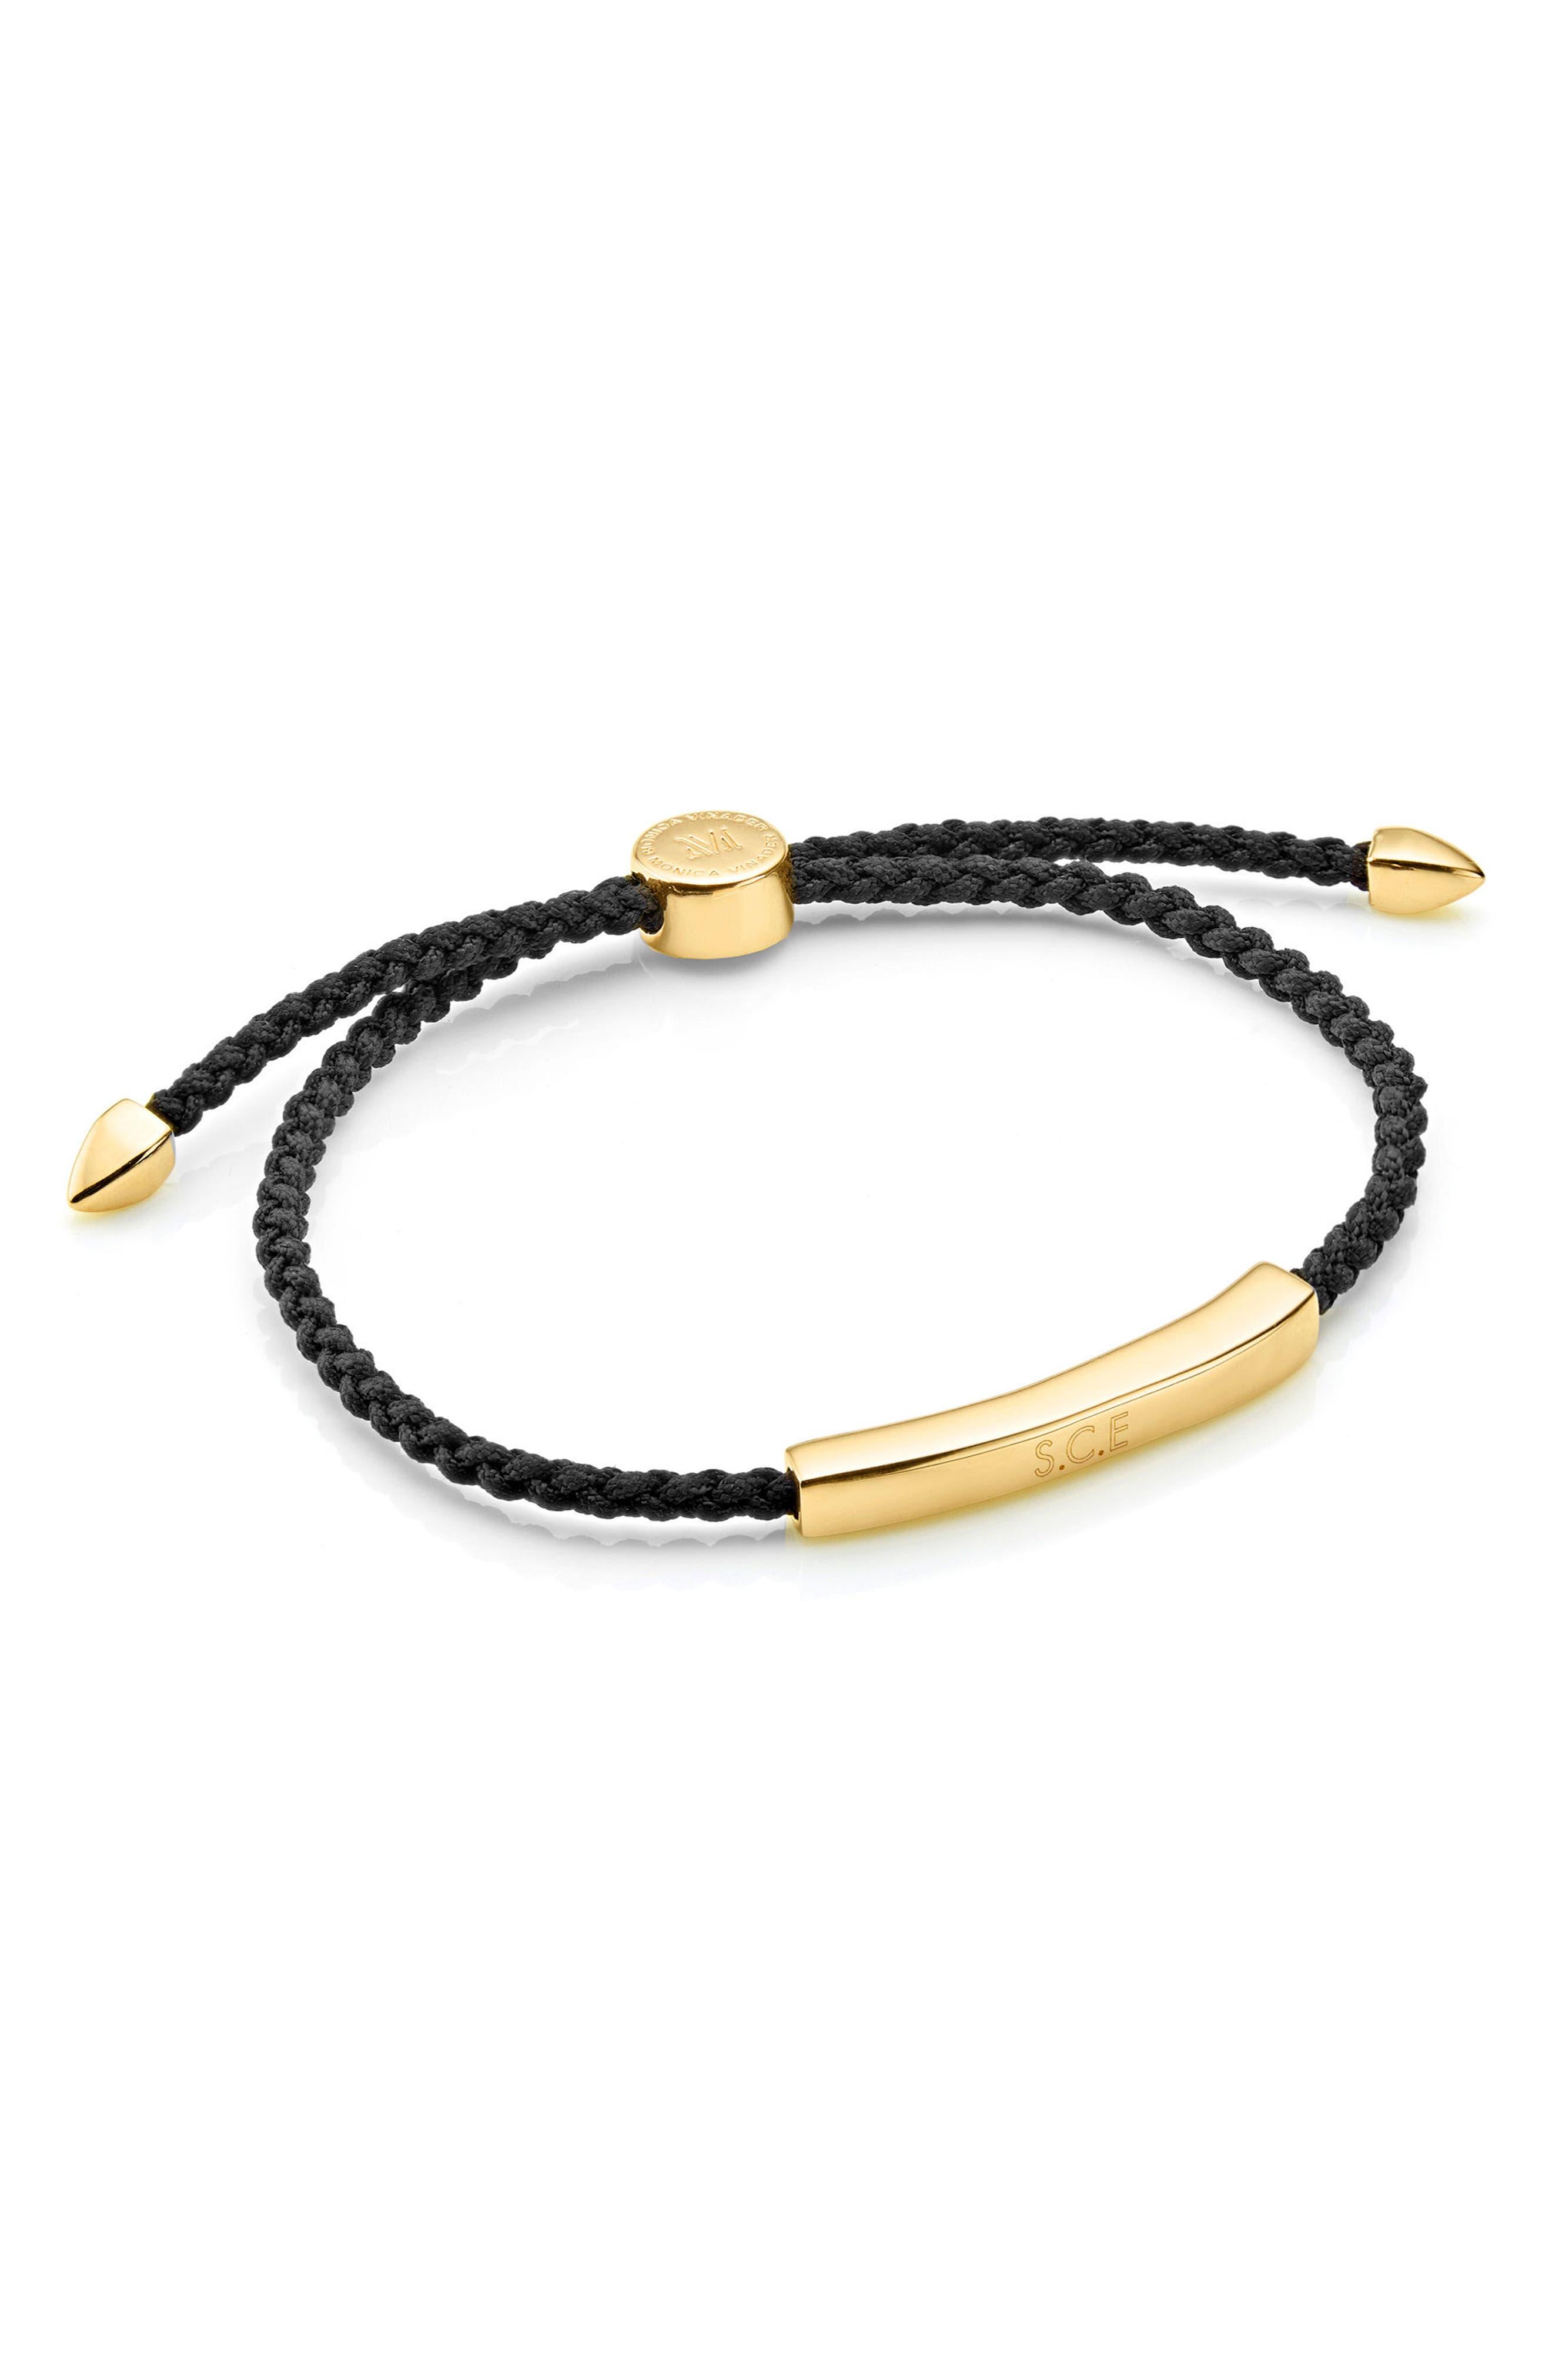 MONICA VINADER, Engravable Men's Linear Friendship Bracelet, Alternate thumbnail 2, color, 001